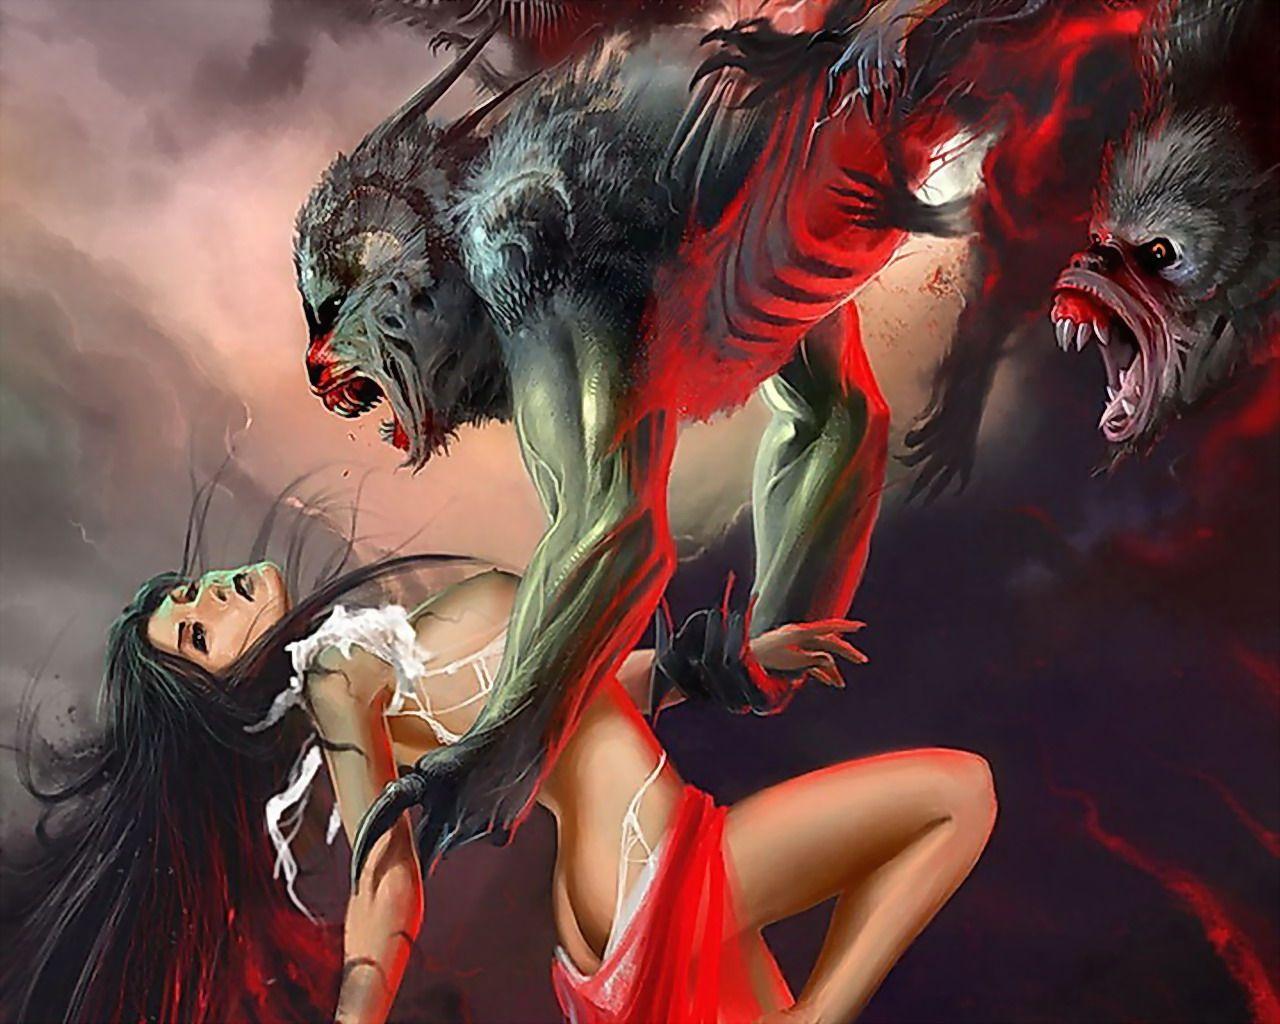 Werewolf porn pics naked natural tits